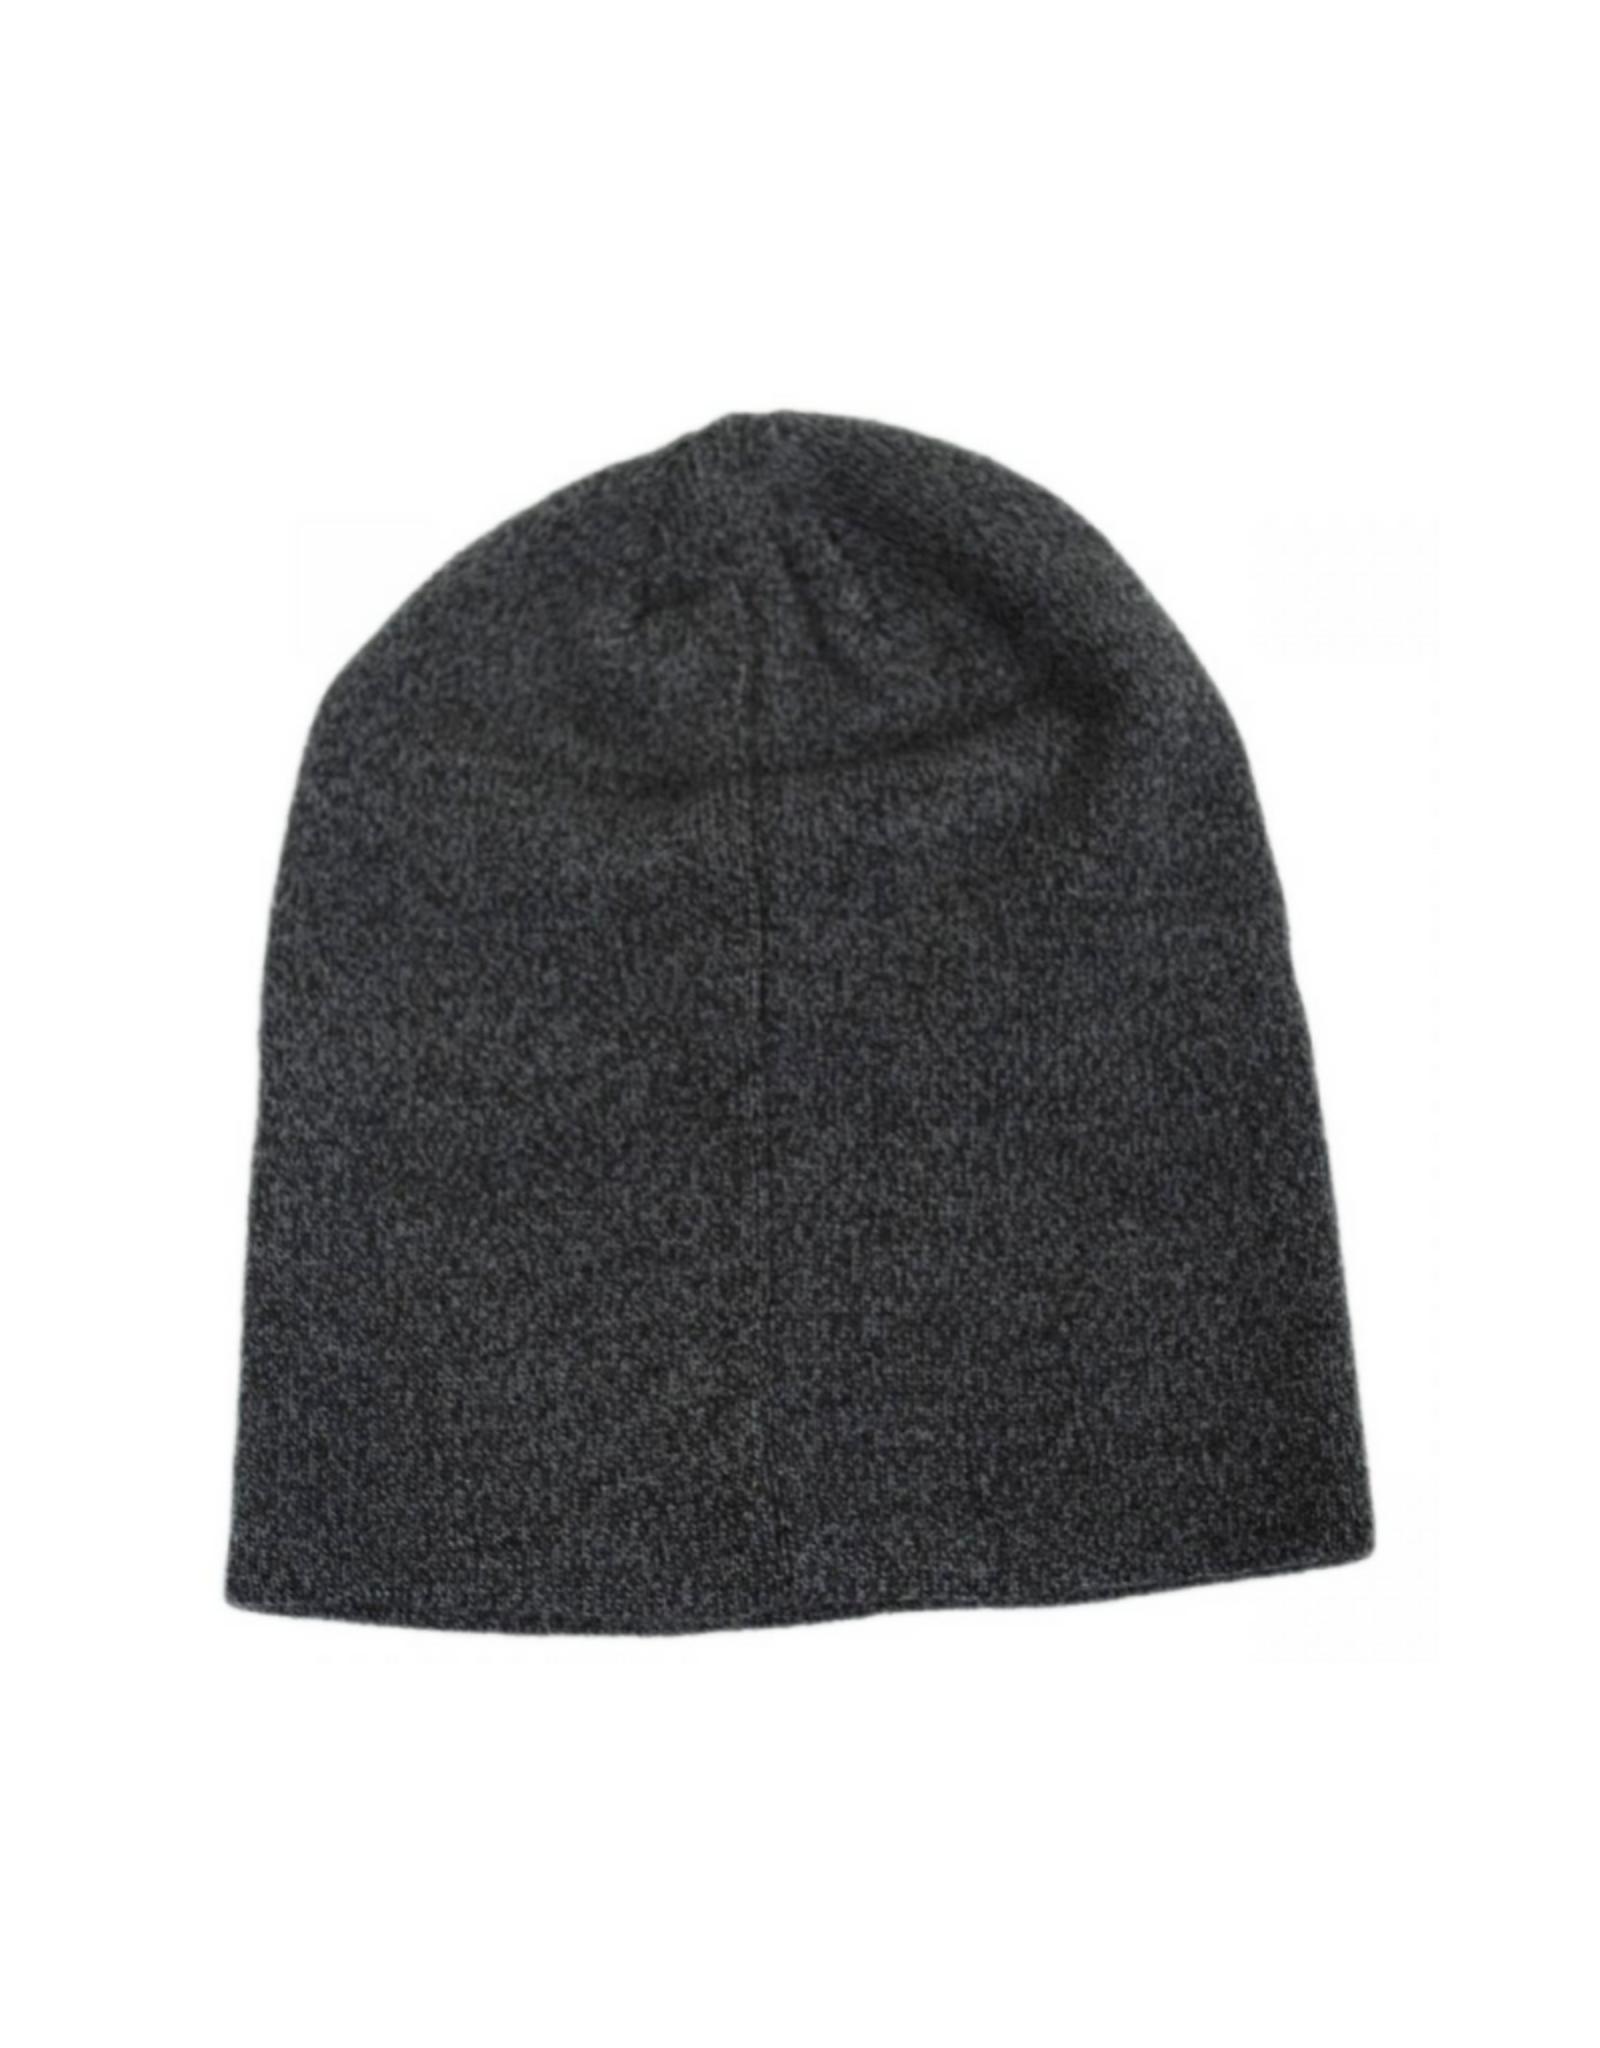 HAT-KNIT BEANIE-SLOUCHY, SHREDDER